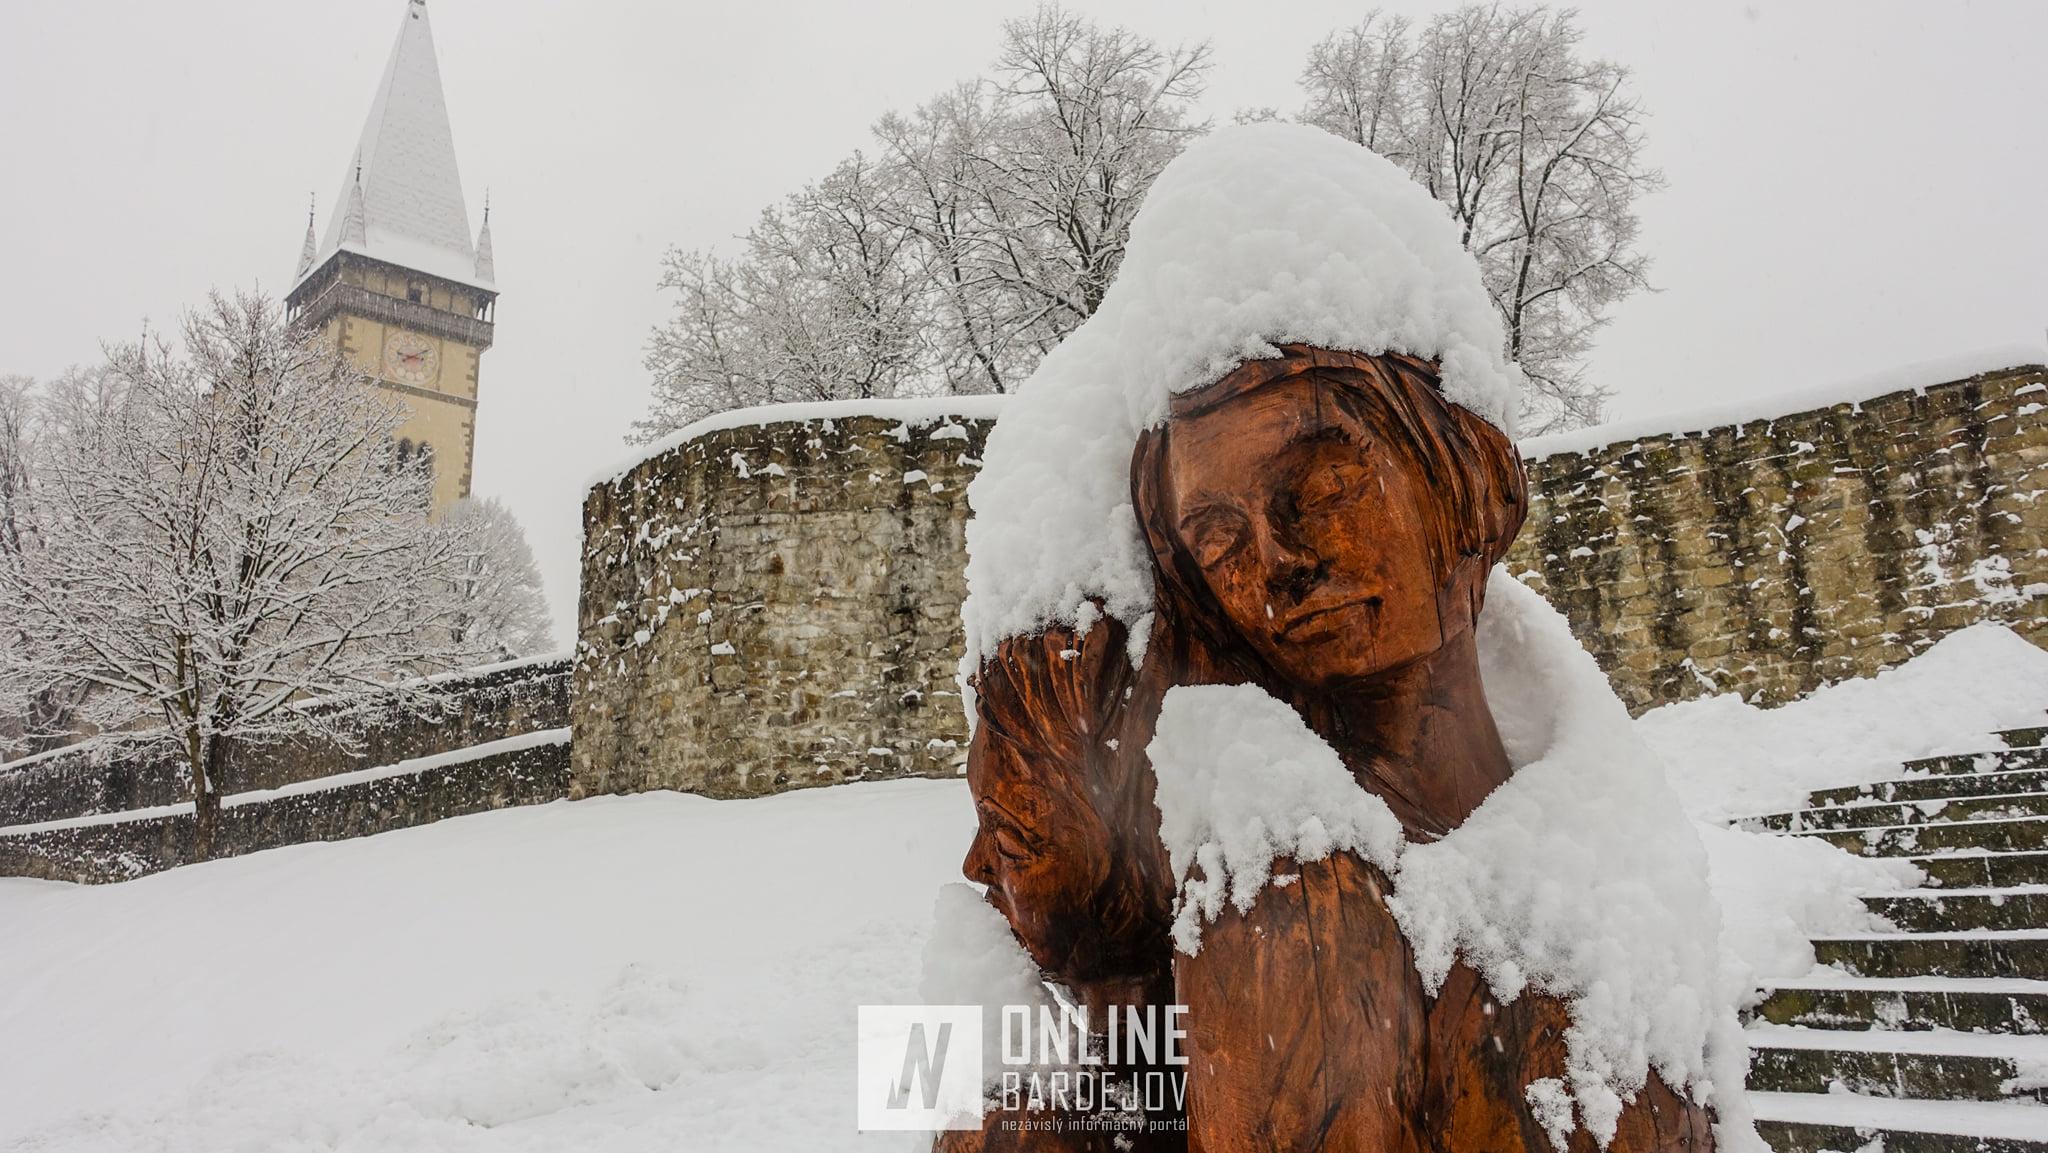 Bardejov zasypal sneh. Pozrite si ako to vyzeralo v meste!